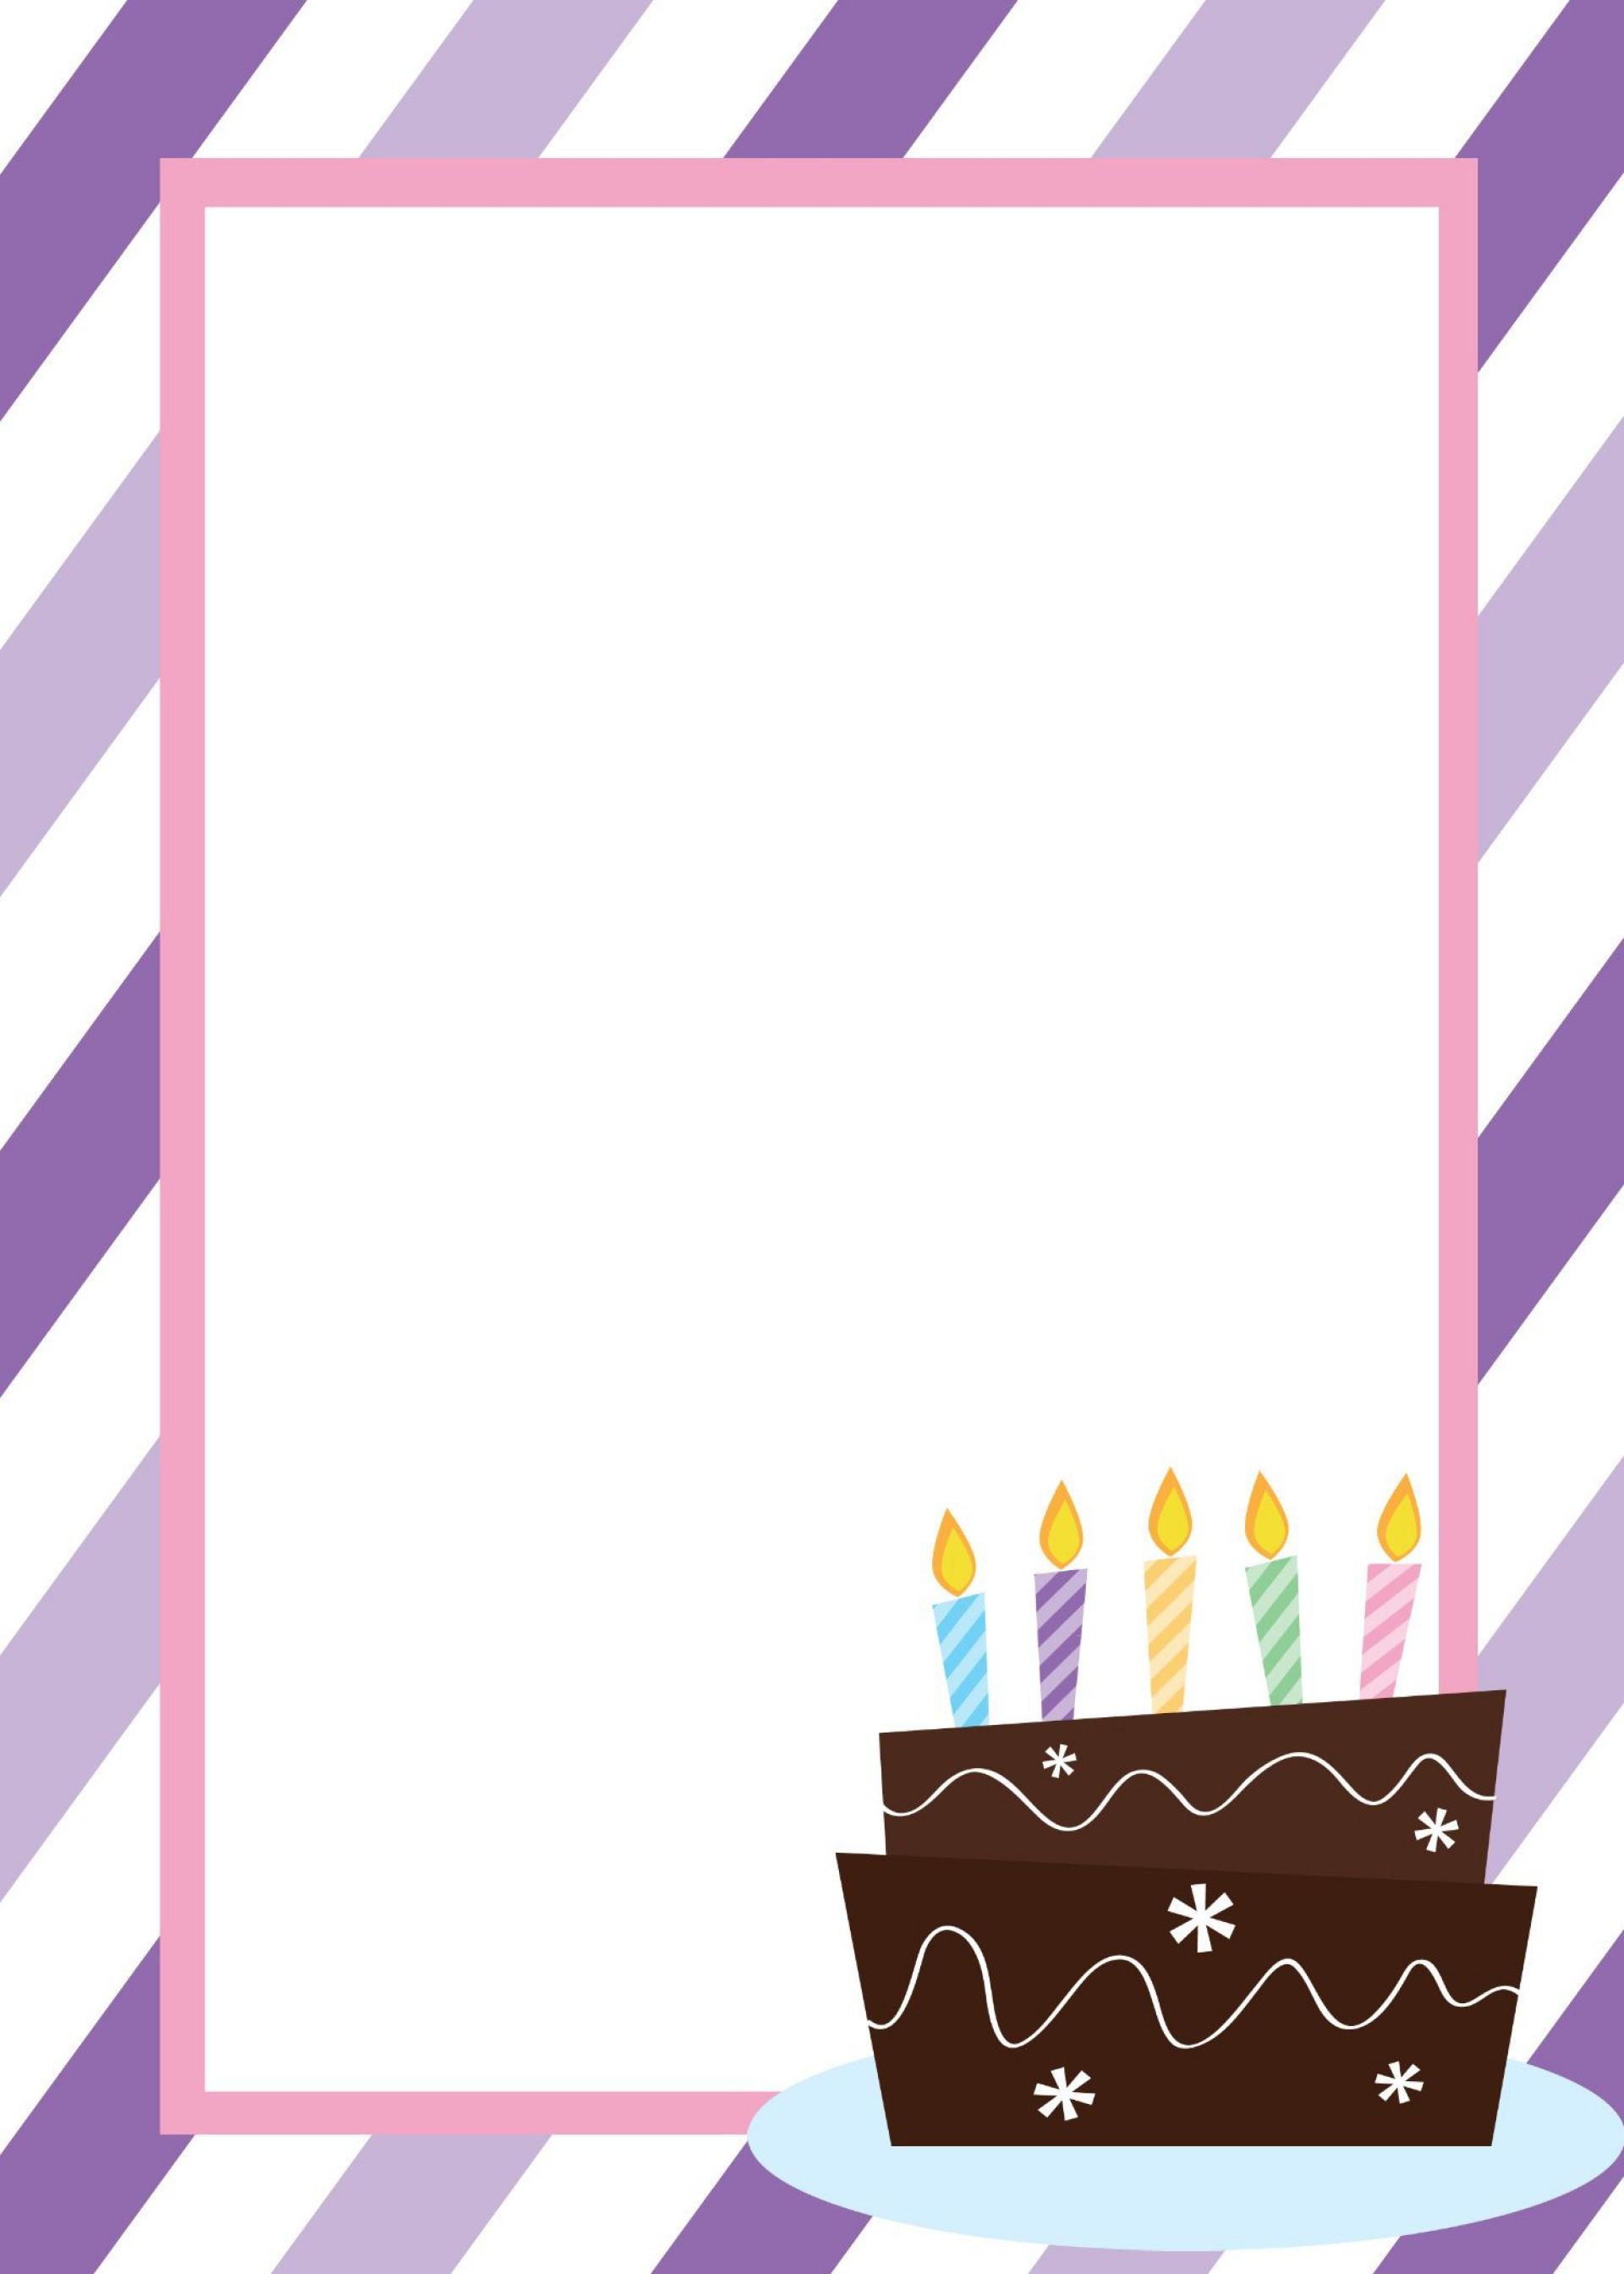 003 Magnificent Free Birthday Party Invitation Template Sample  Templates Printable 16th Australia Uk1920